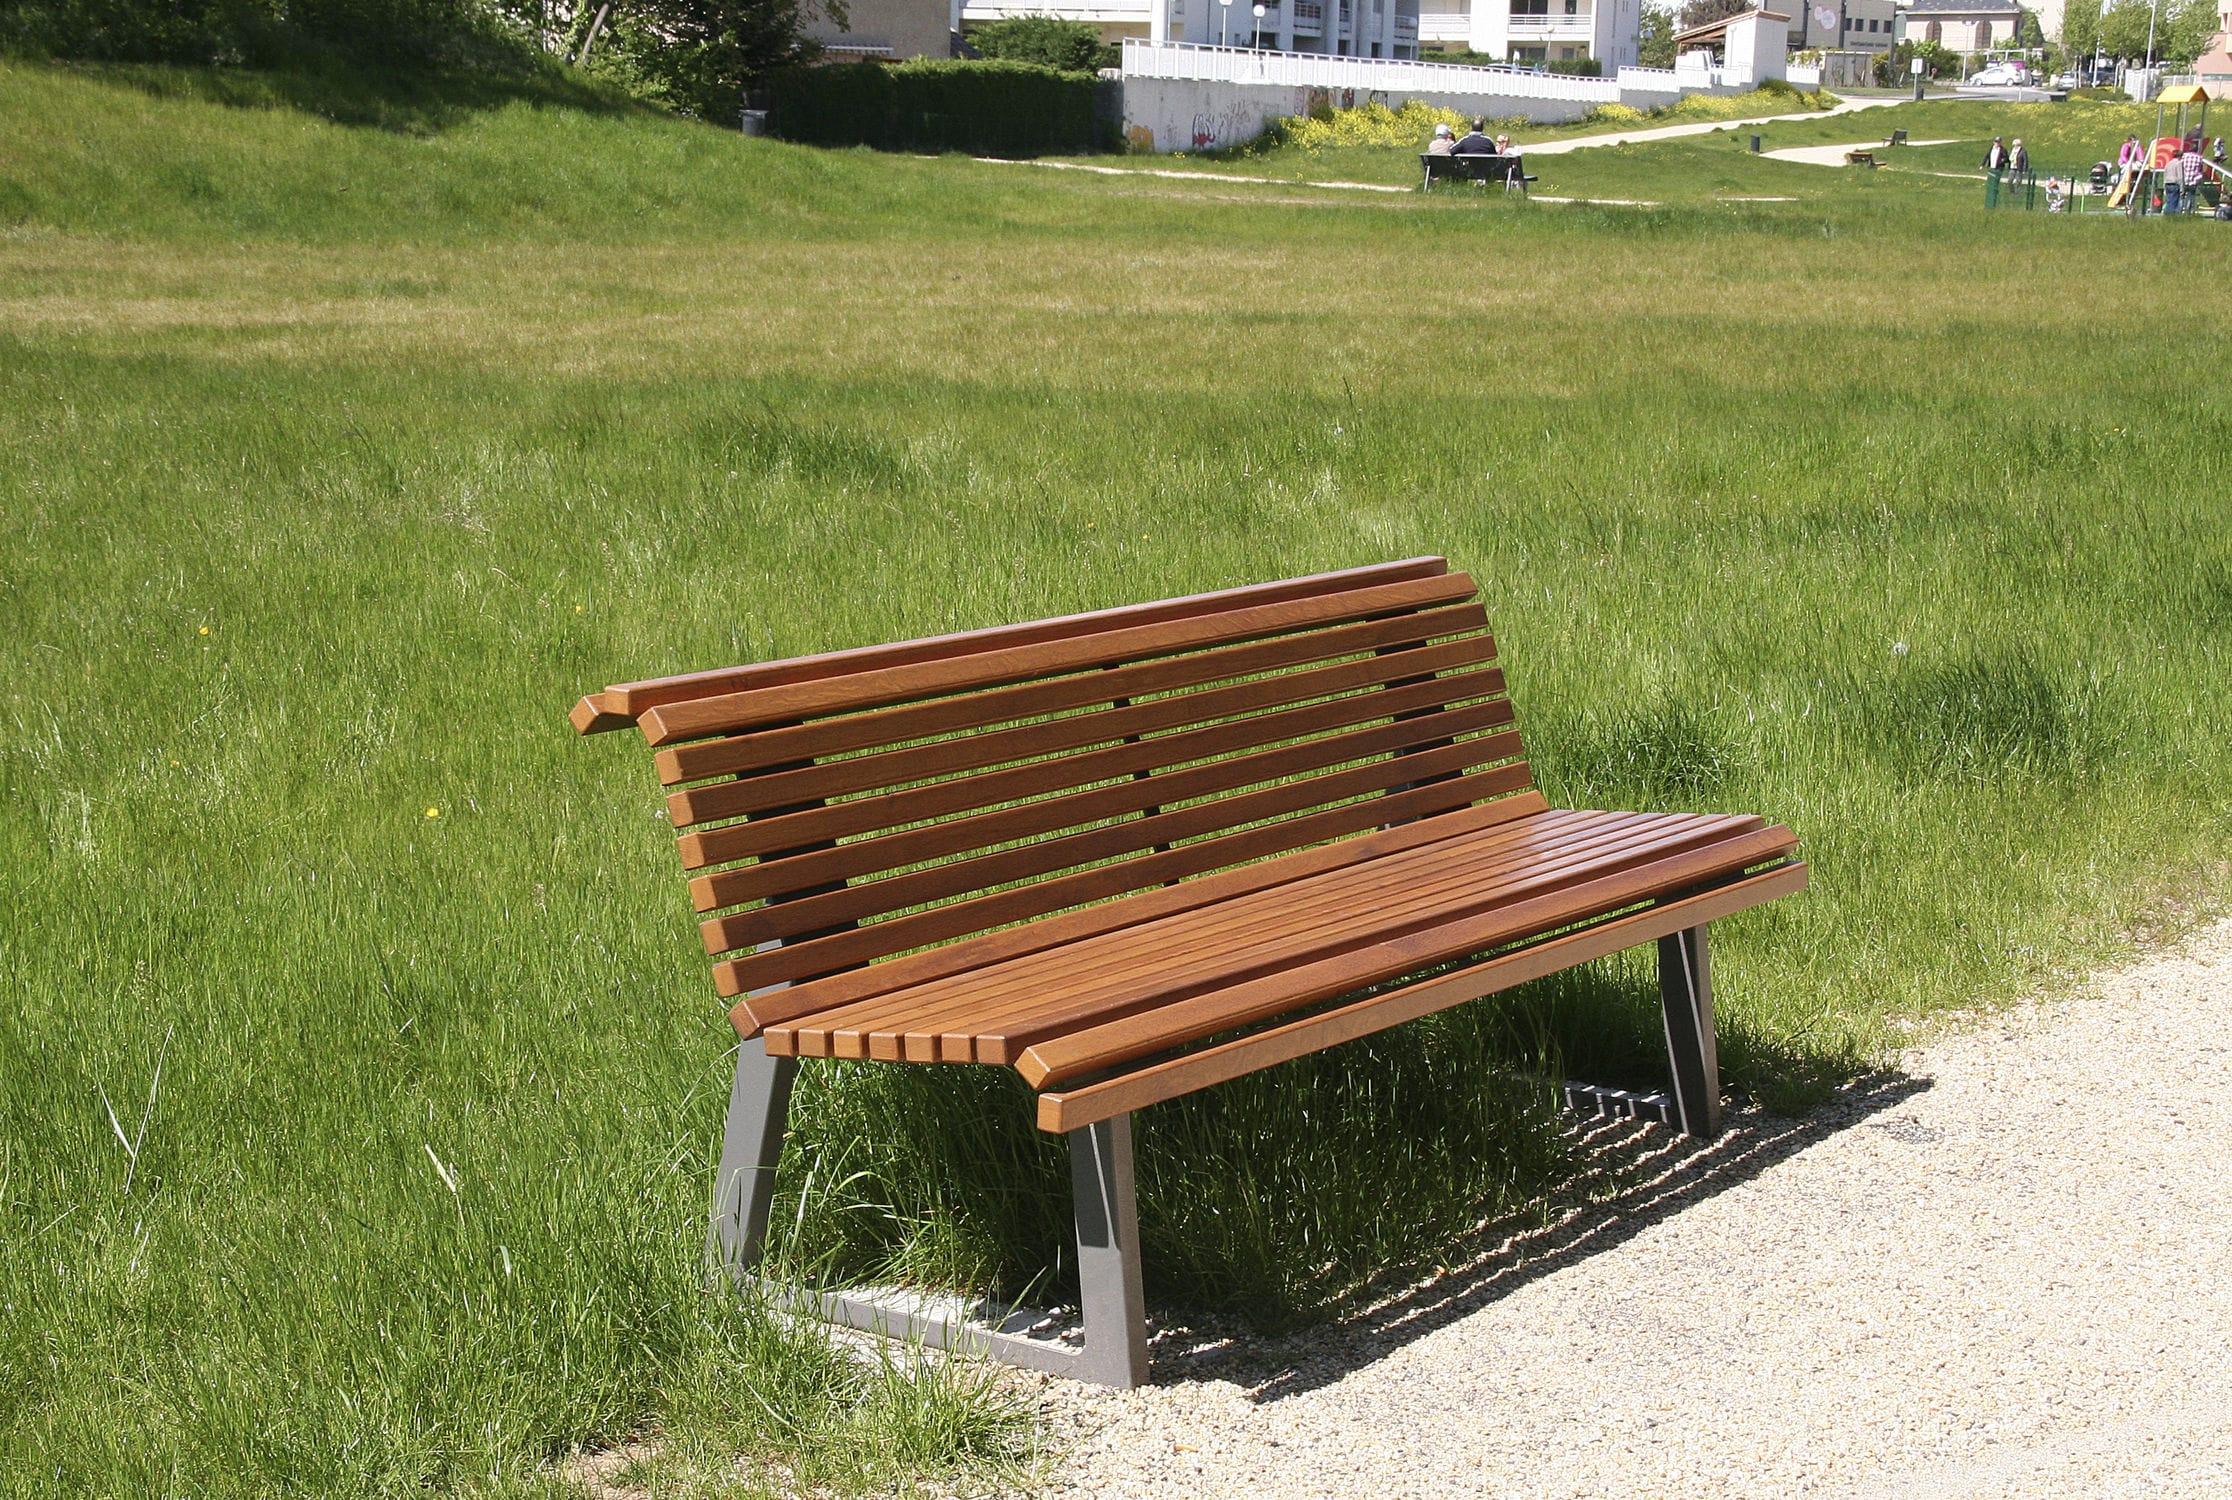 Banc public de jardin contemporain en chªne TIMEO ACCENTURBA